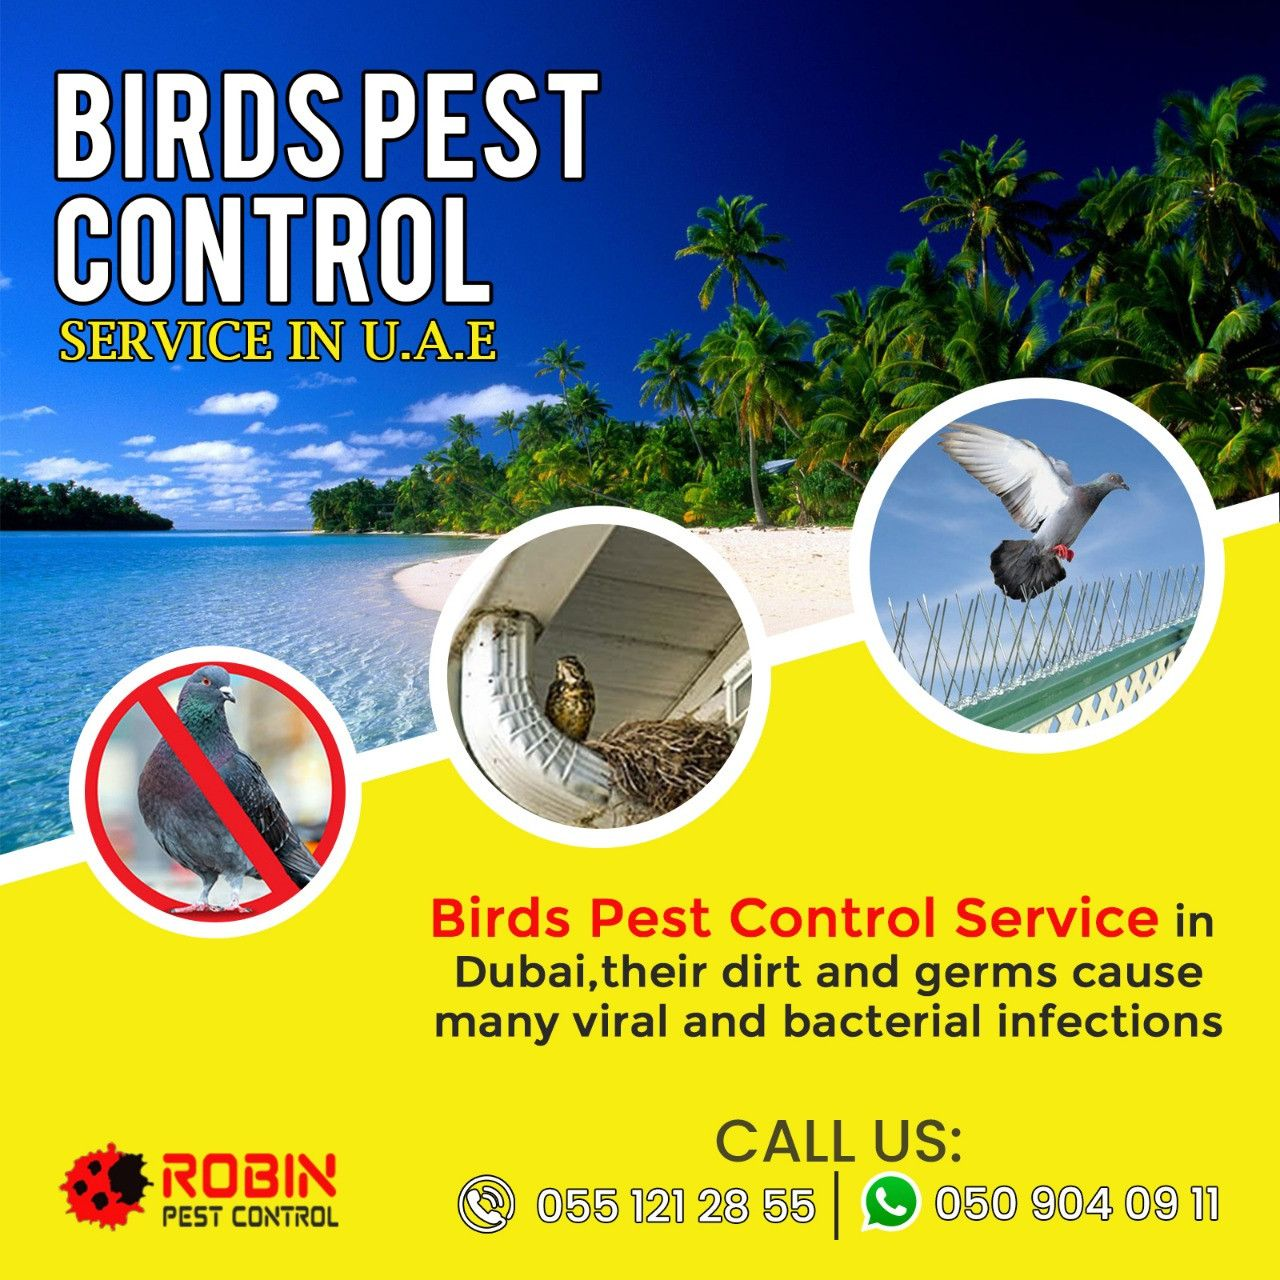 Robin Pest Control 3